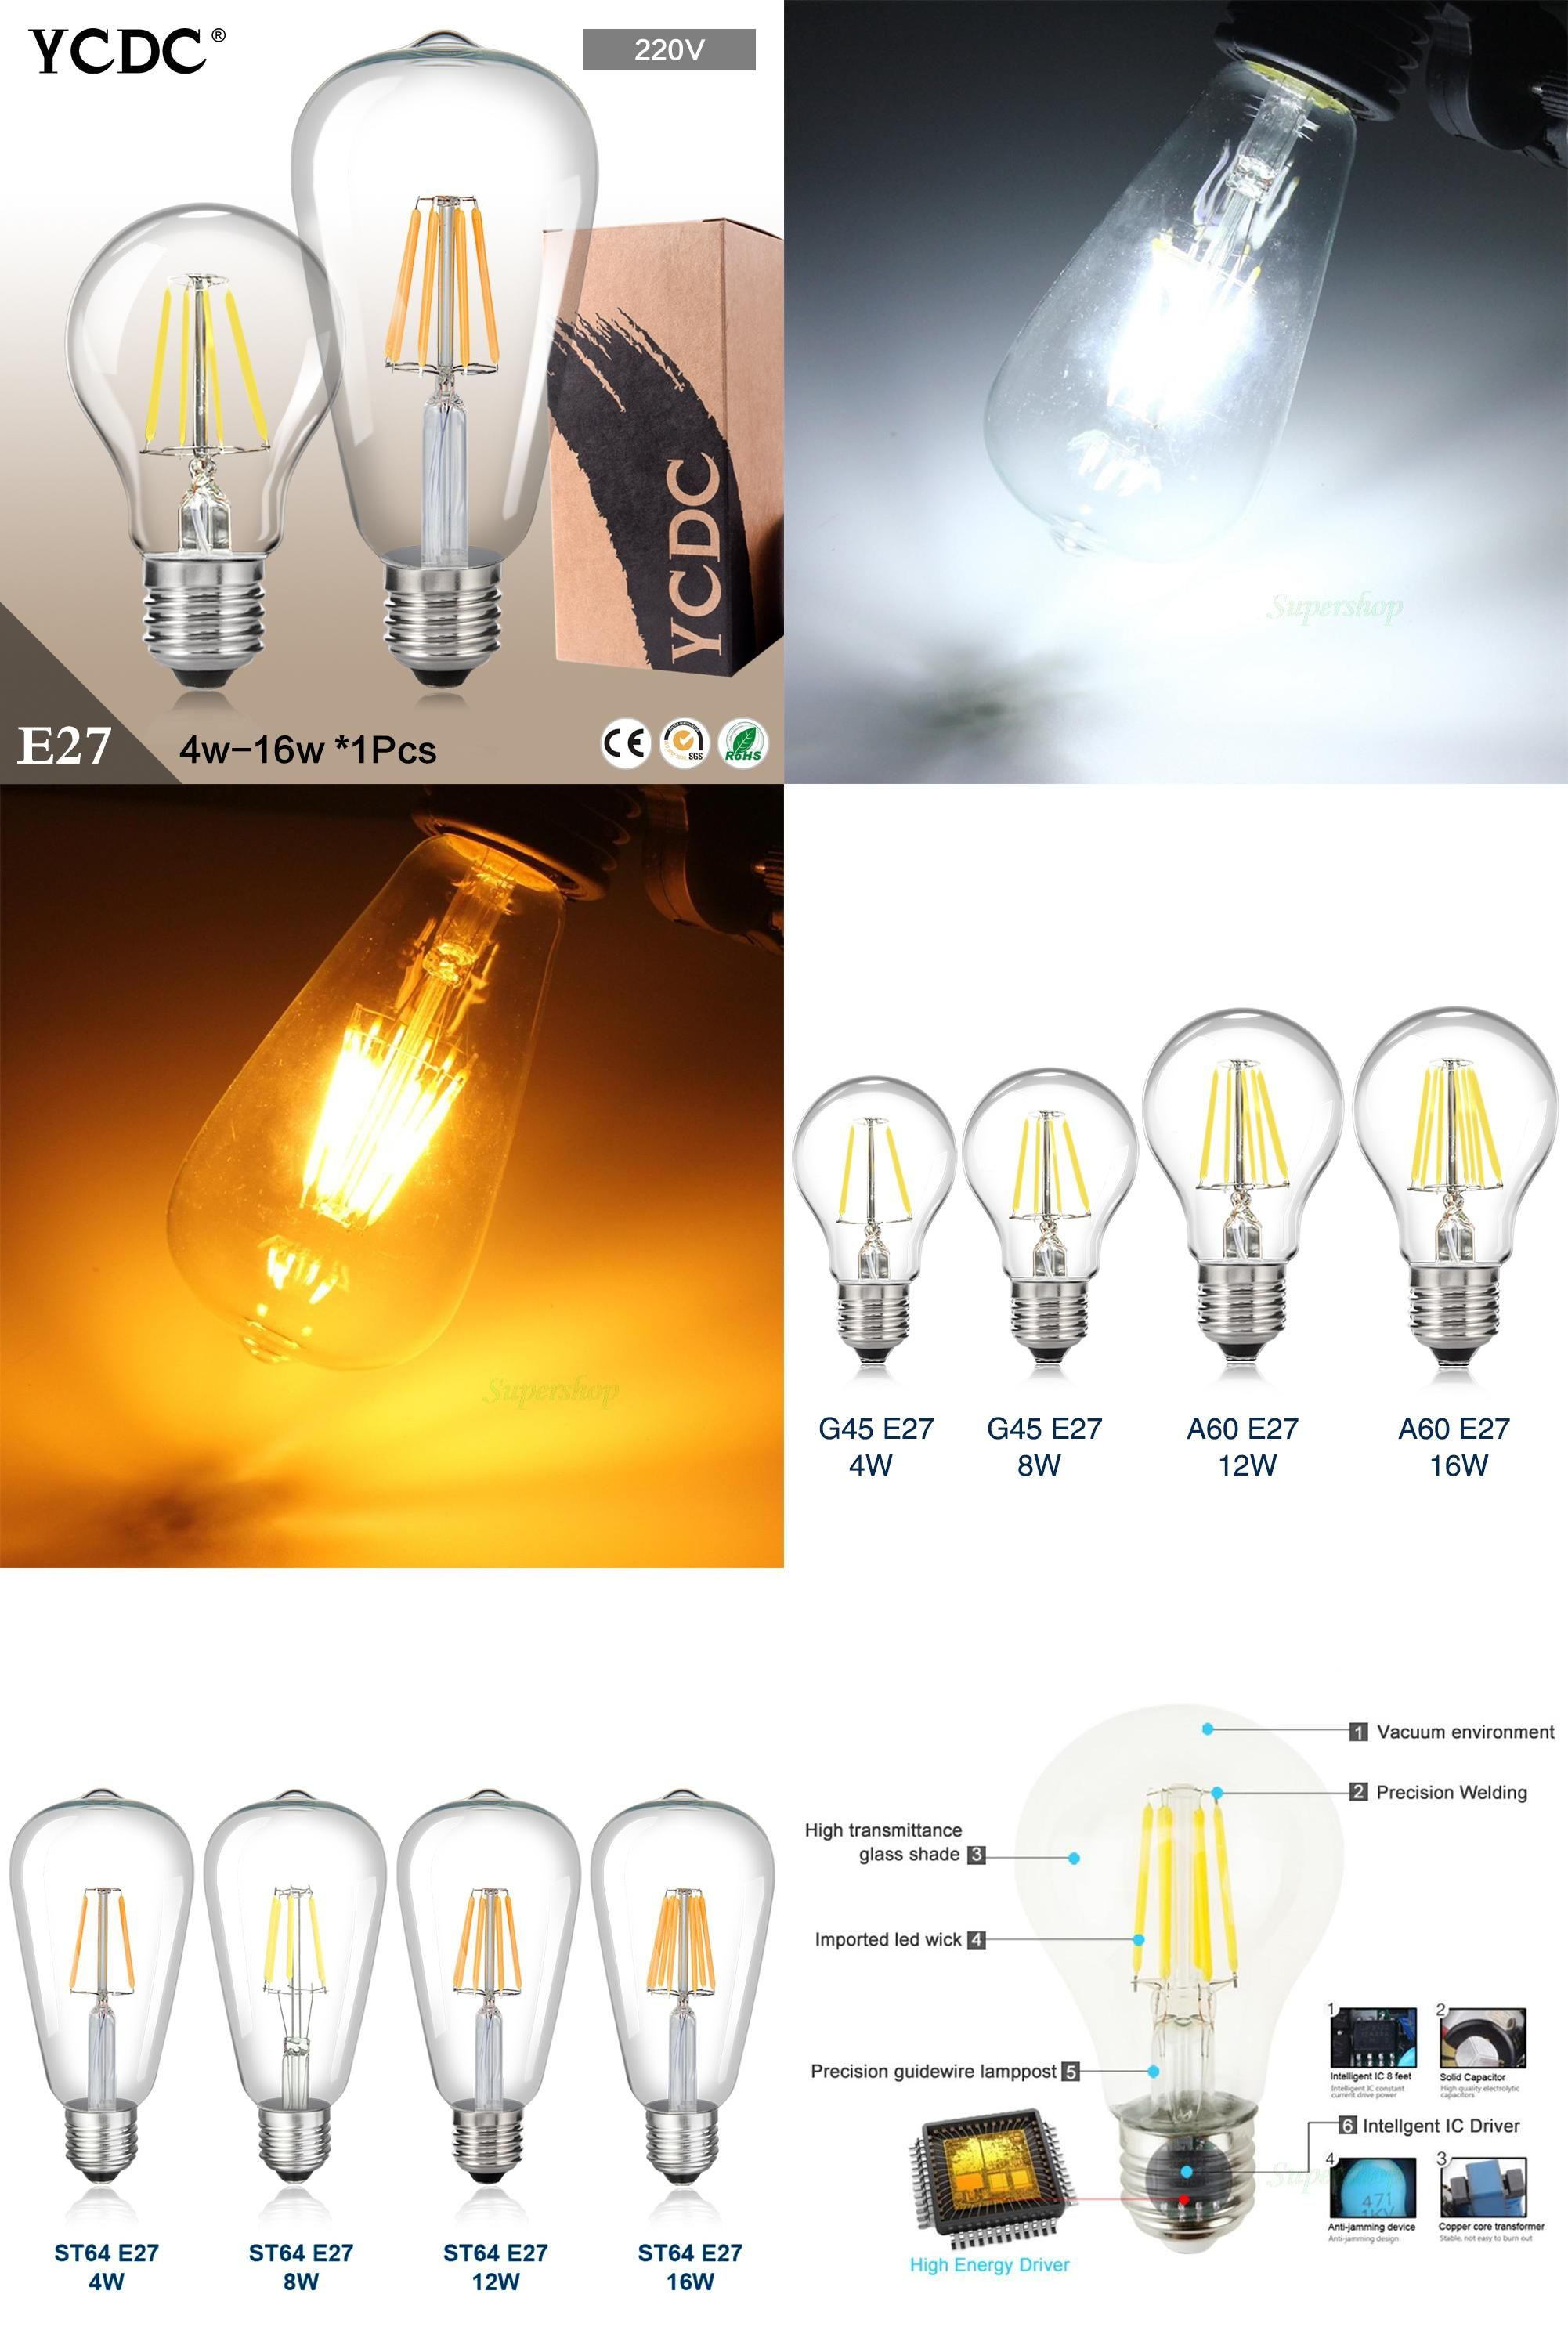 Visit To Buy Tsleen Cheap Led Lamp Lampada E27 Ac 220v Retro Old 4w Fluorescent Driver Edison